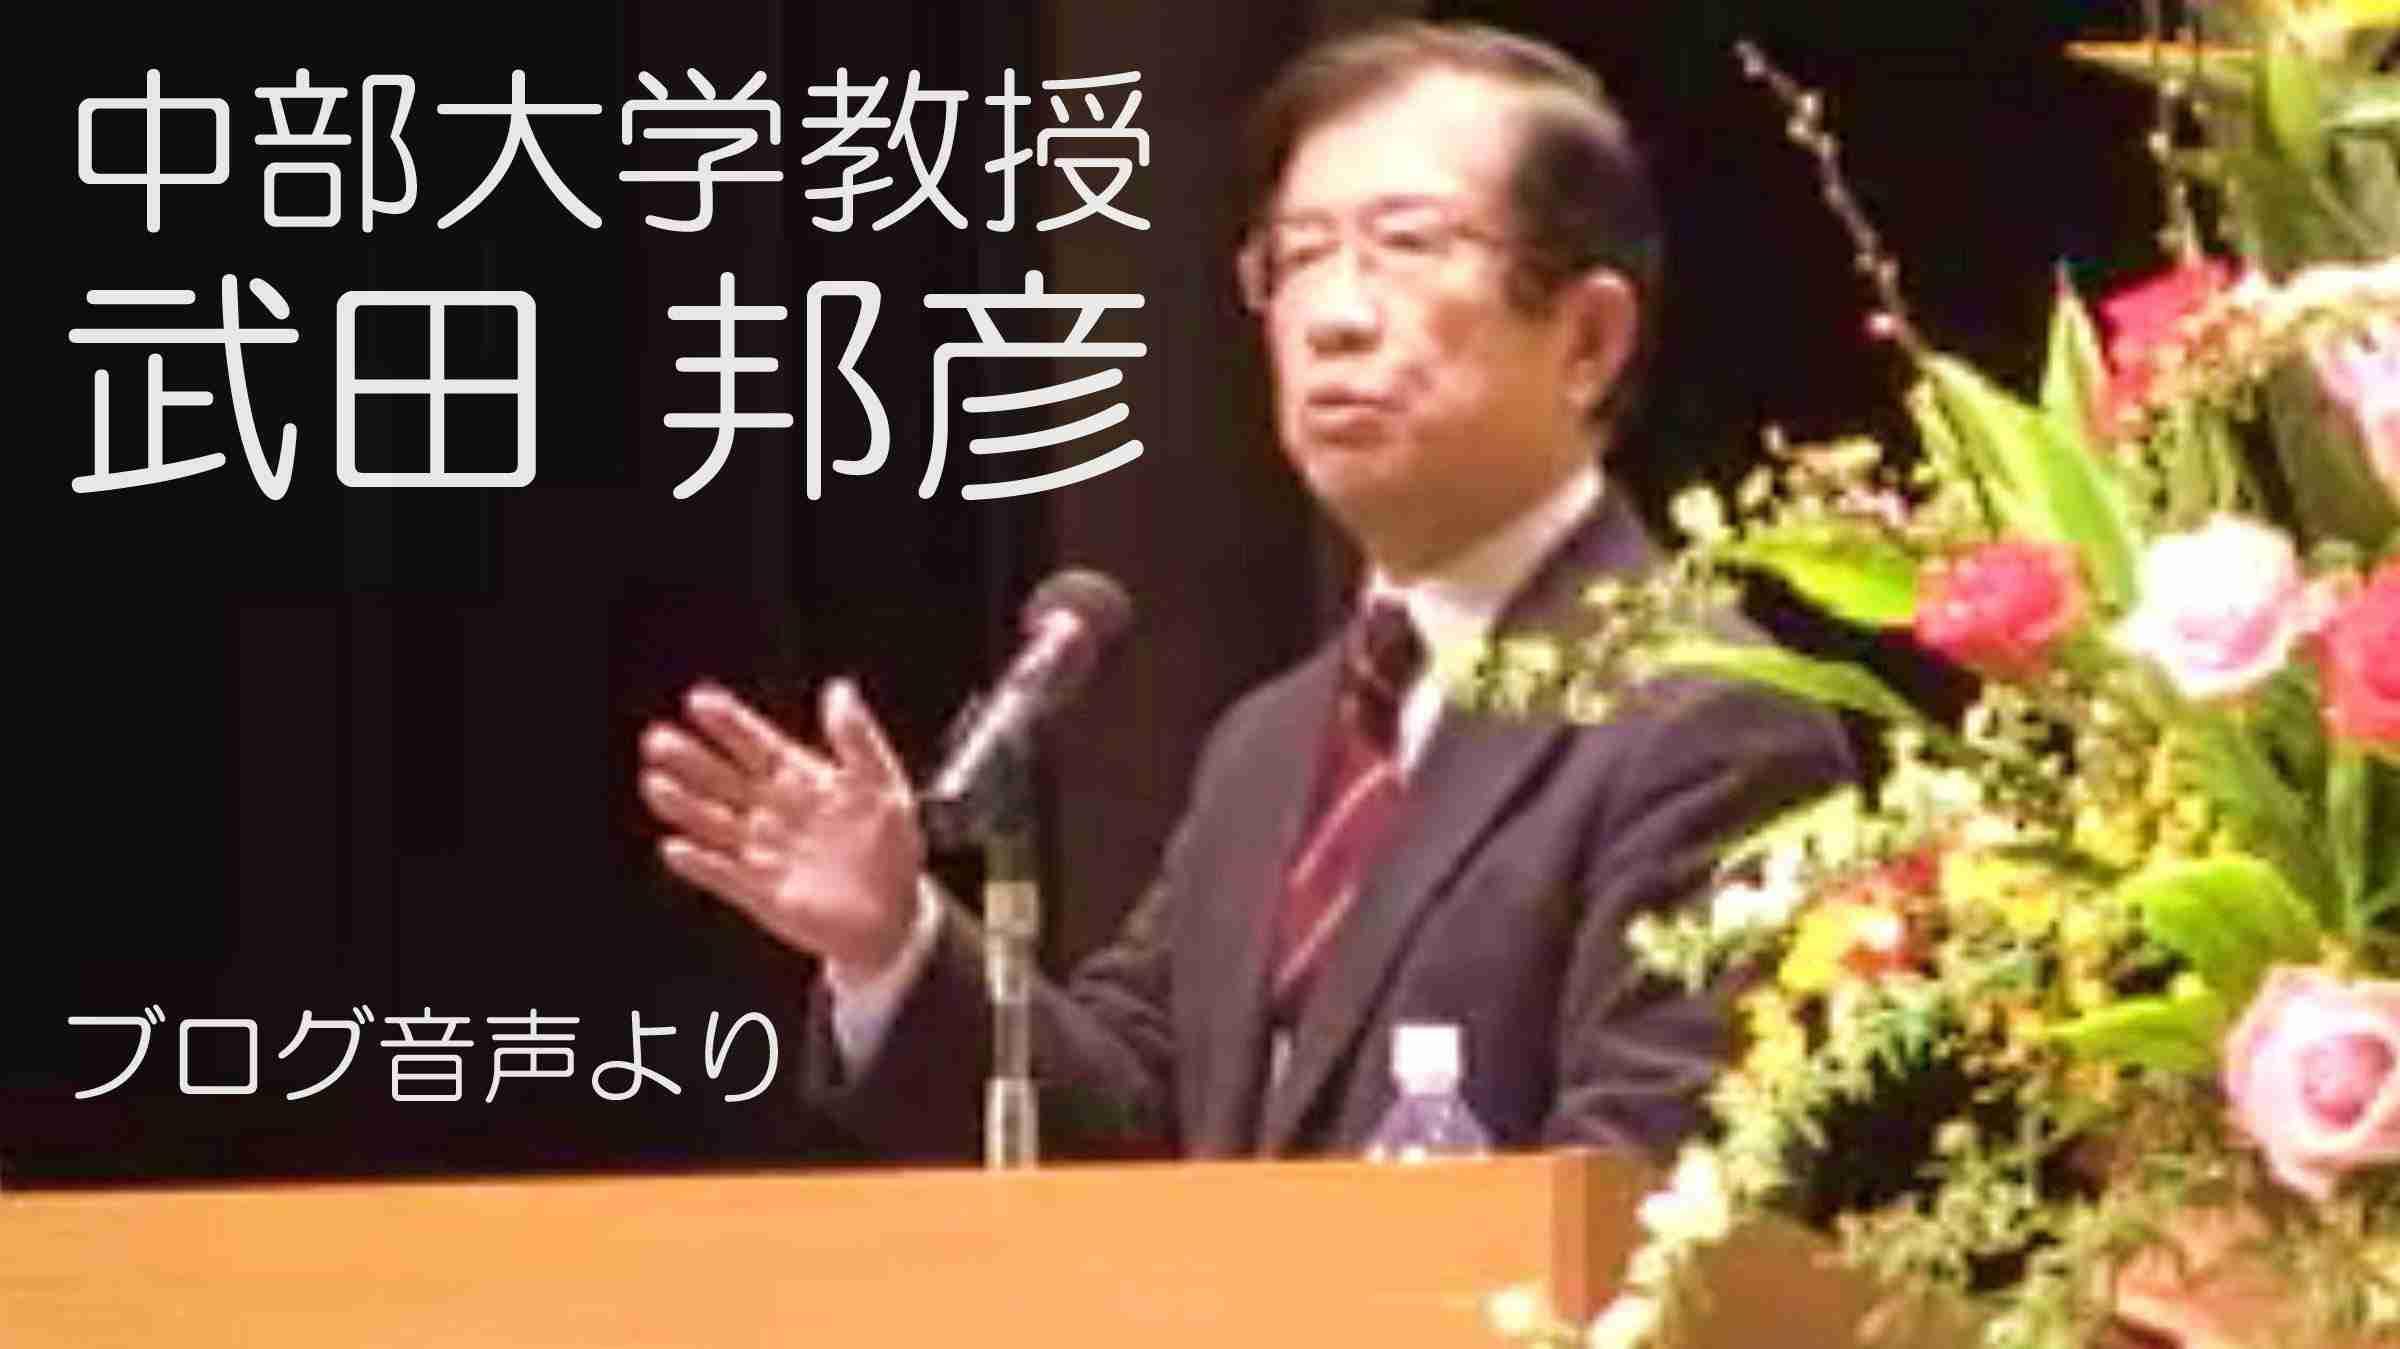 NHK紅白歌合戦は、非常に異常な番組である / 武田 邦彦 - YouTube